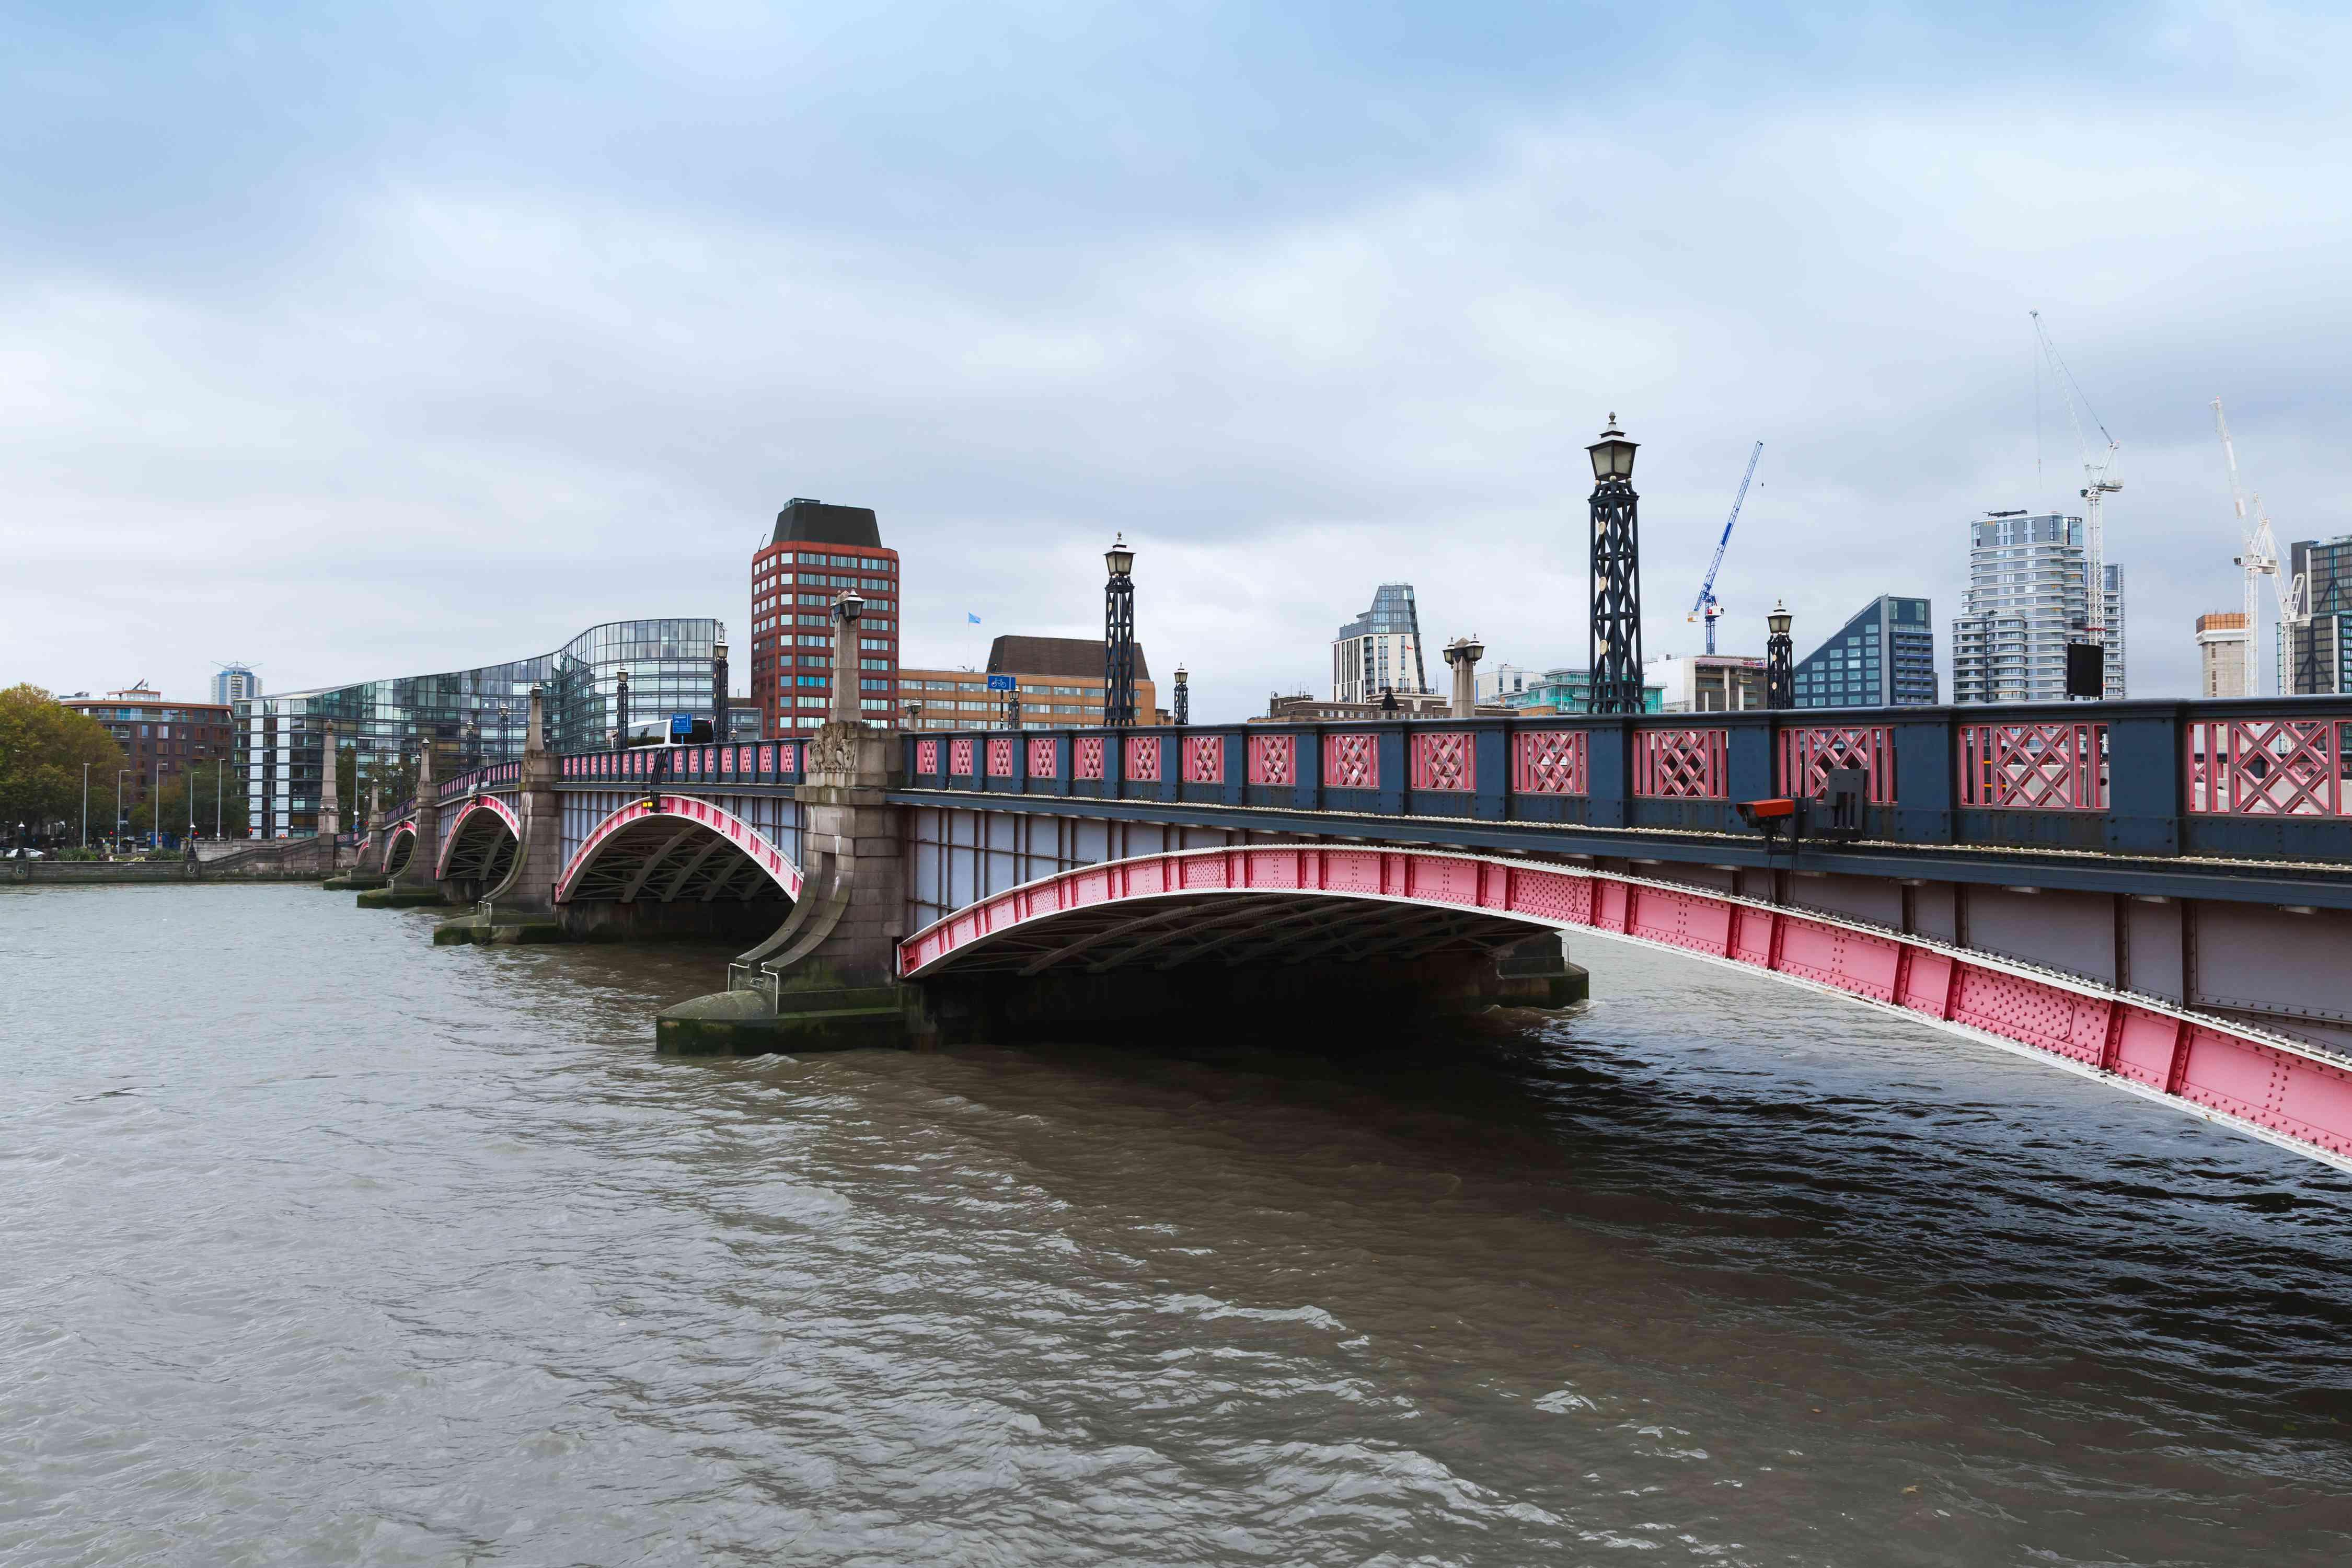 Cityscape of London, Lambeth Bridge